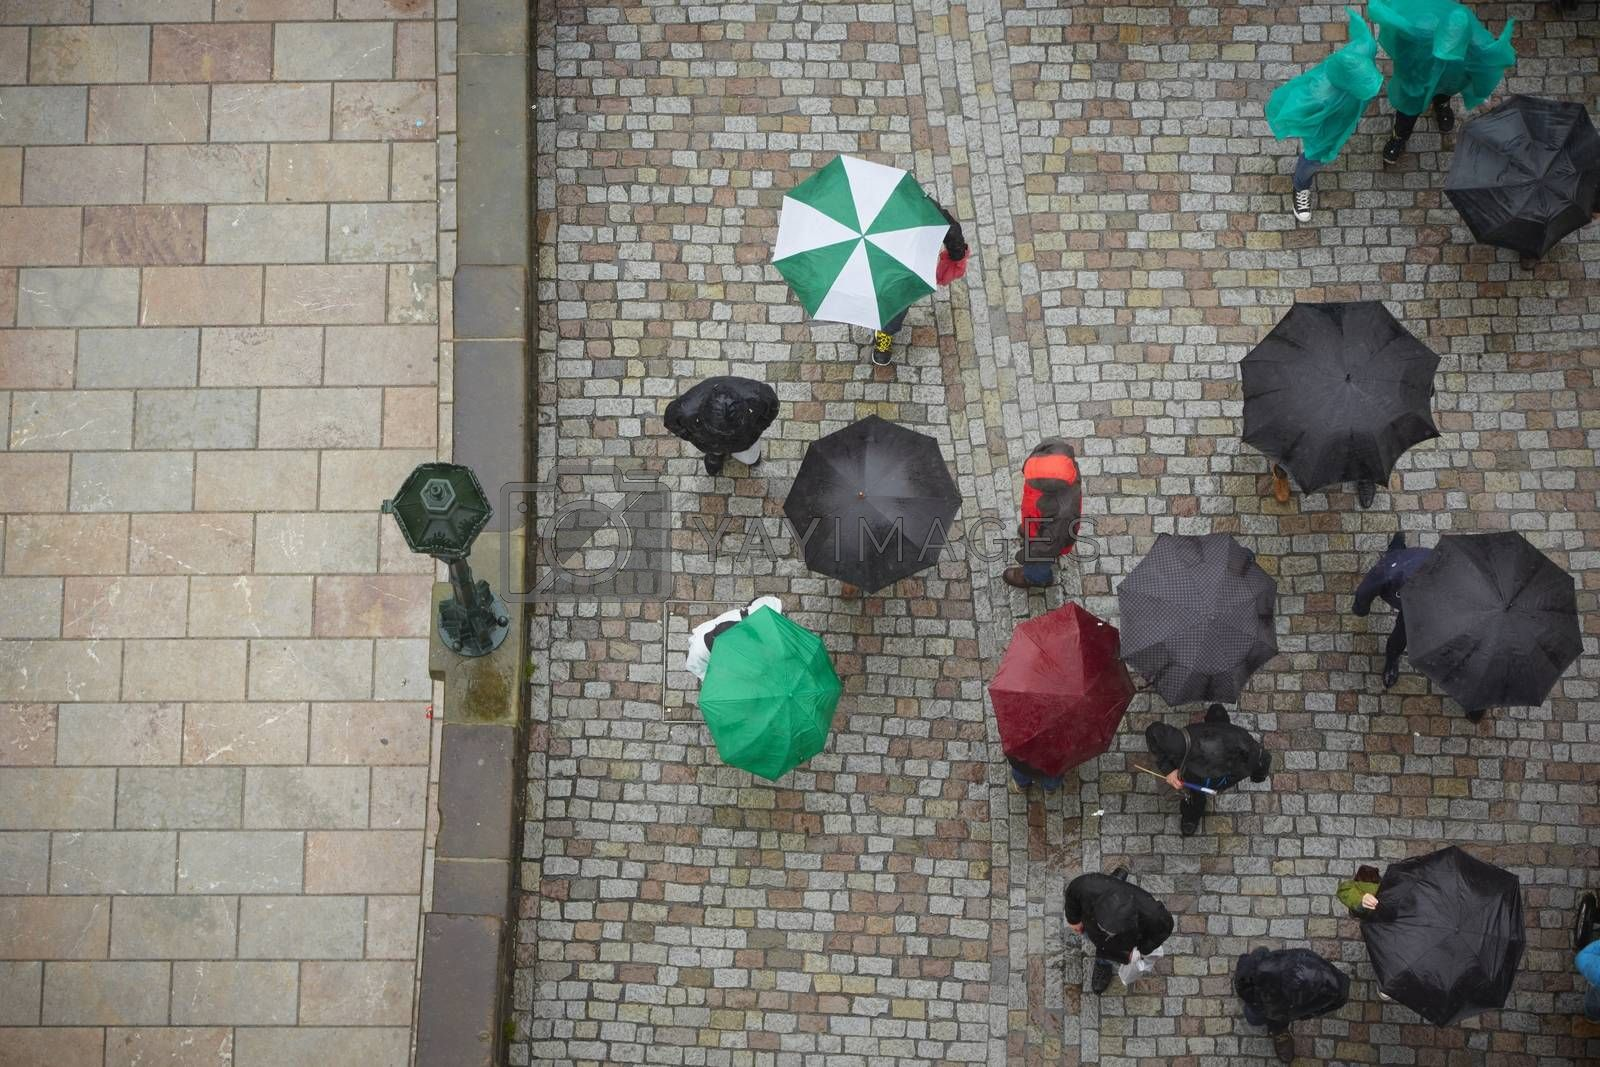 Group of people in rain - Prague, Czech Republic